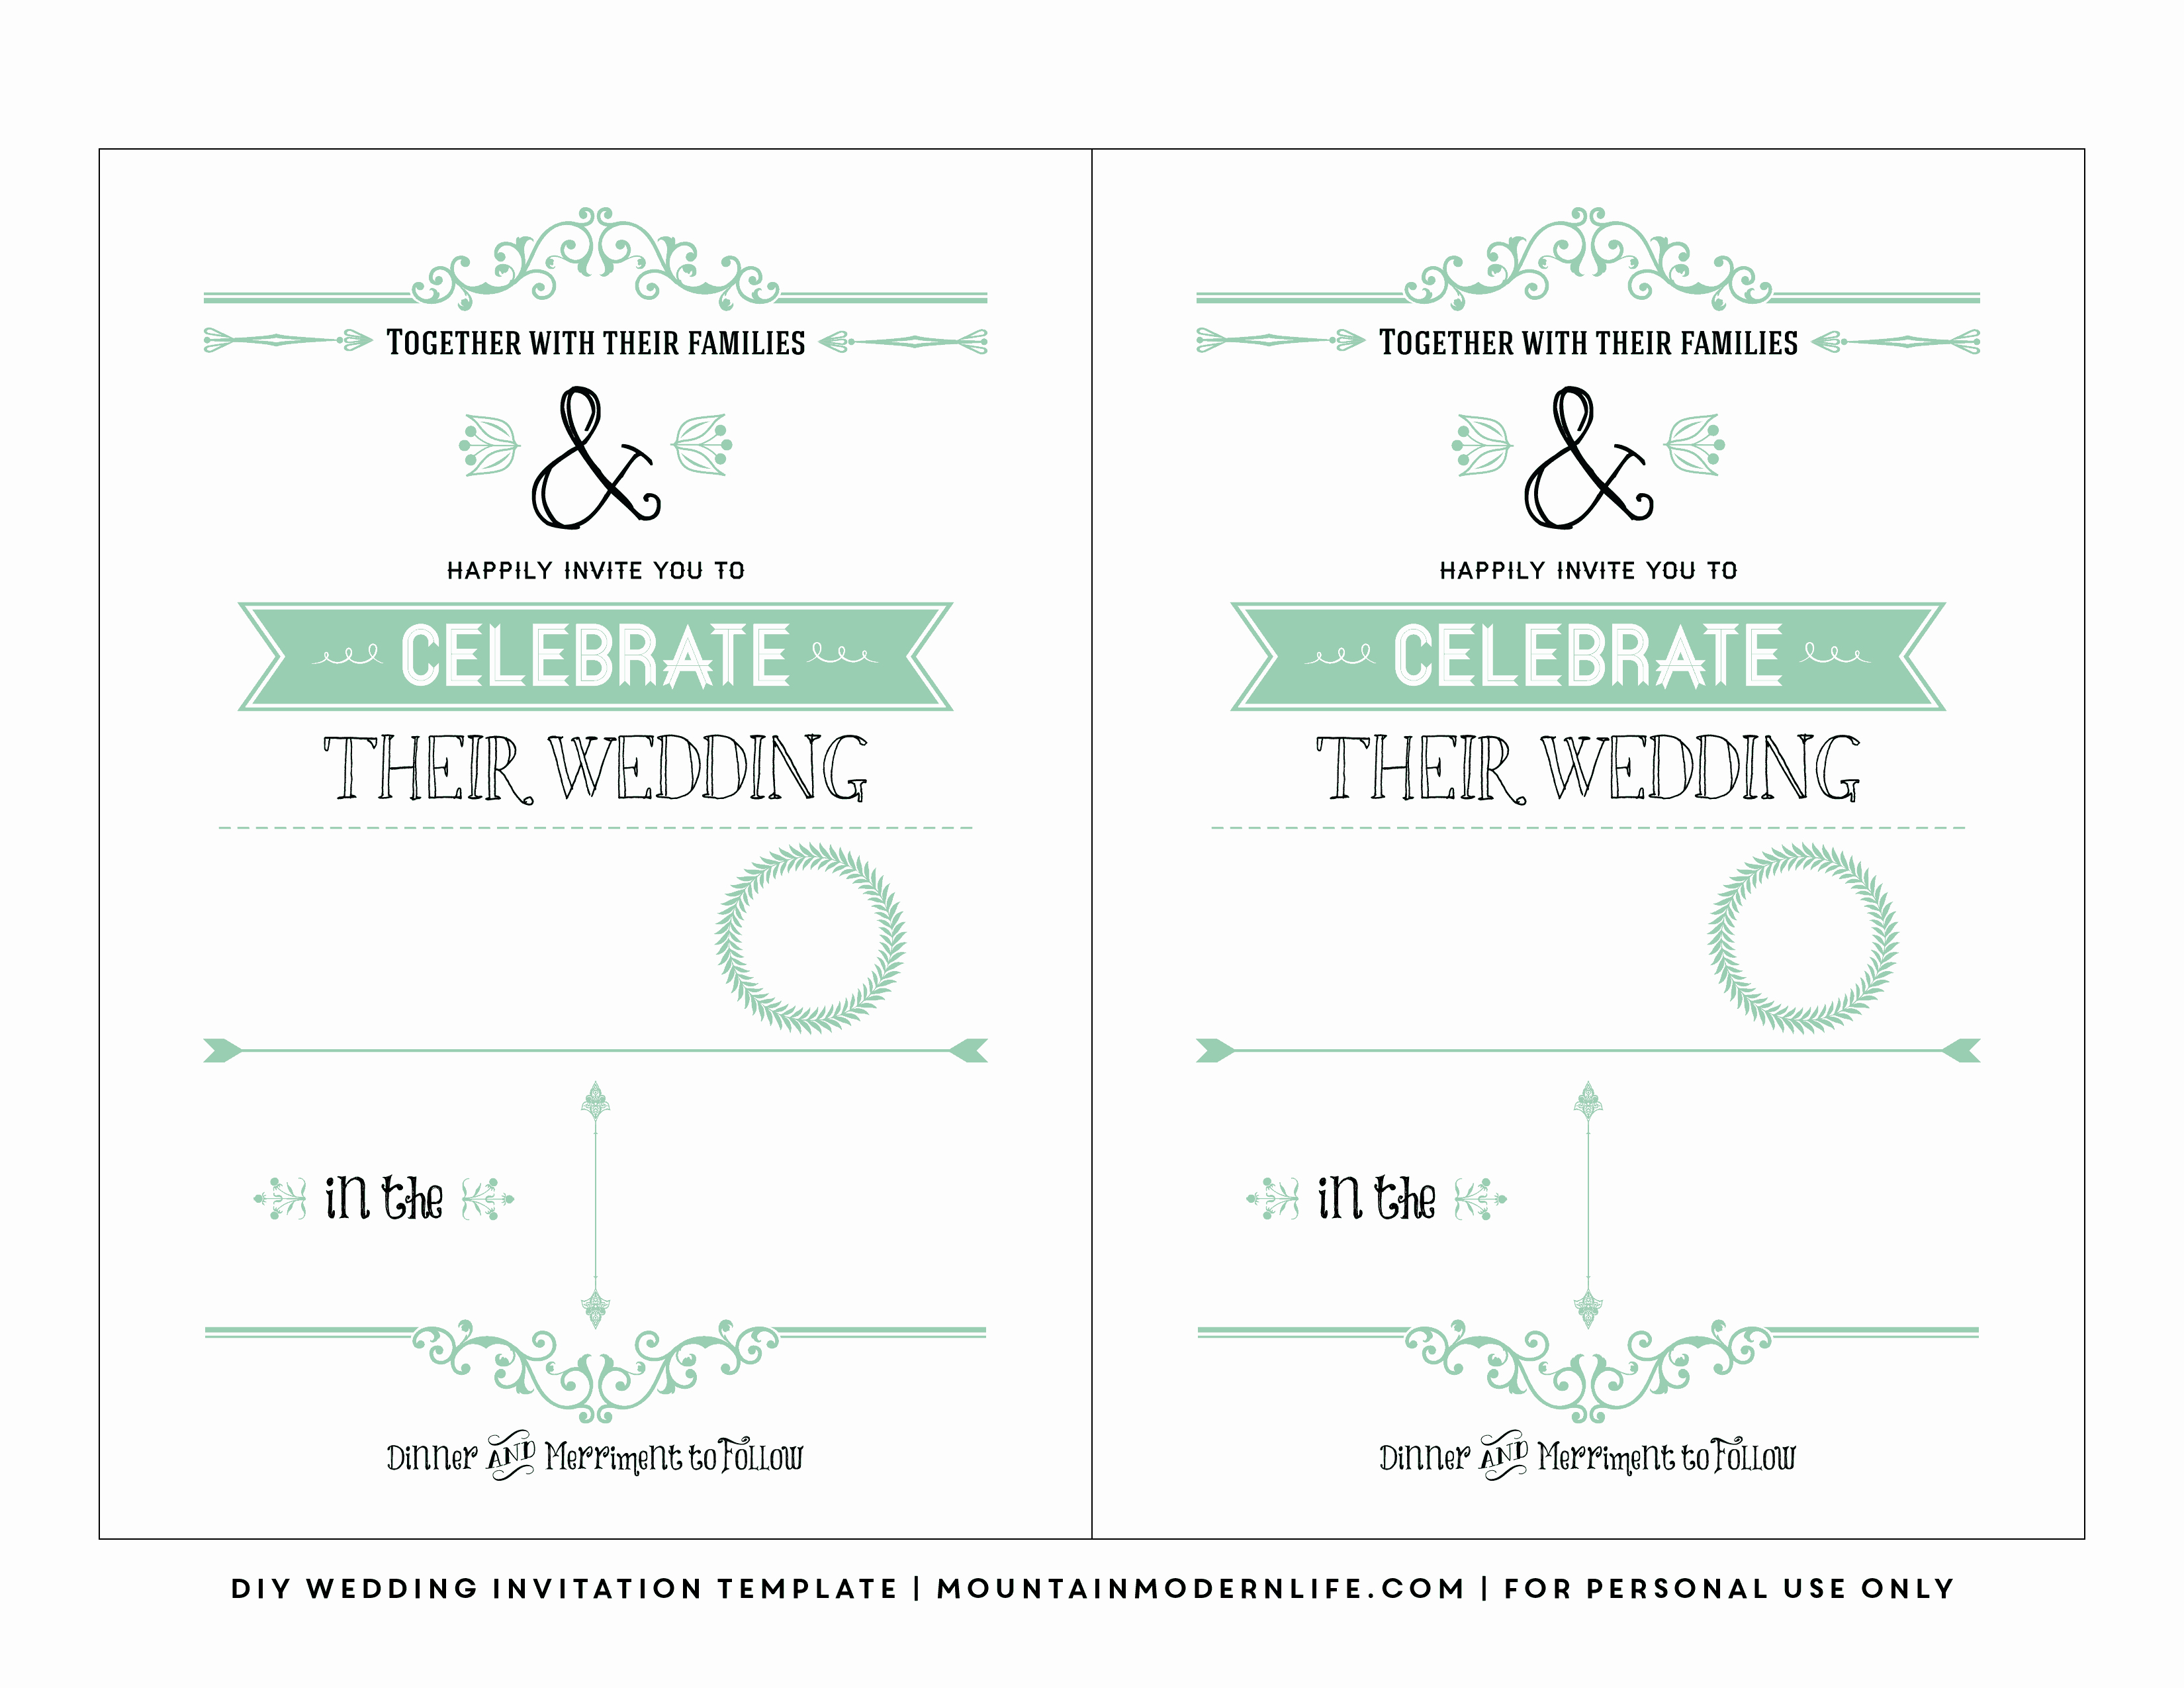 Free Wedding Invitation Templates Download Best Of Free Wedding Invitation Template